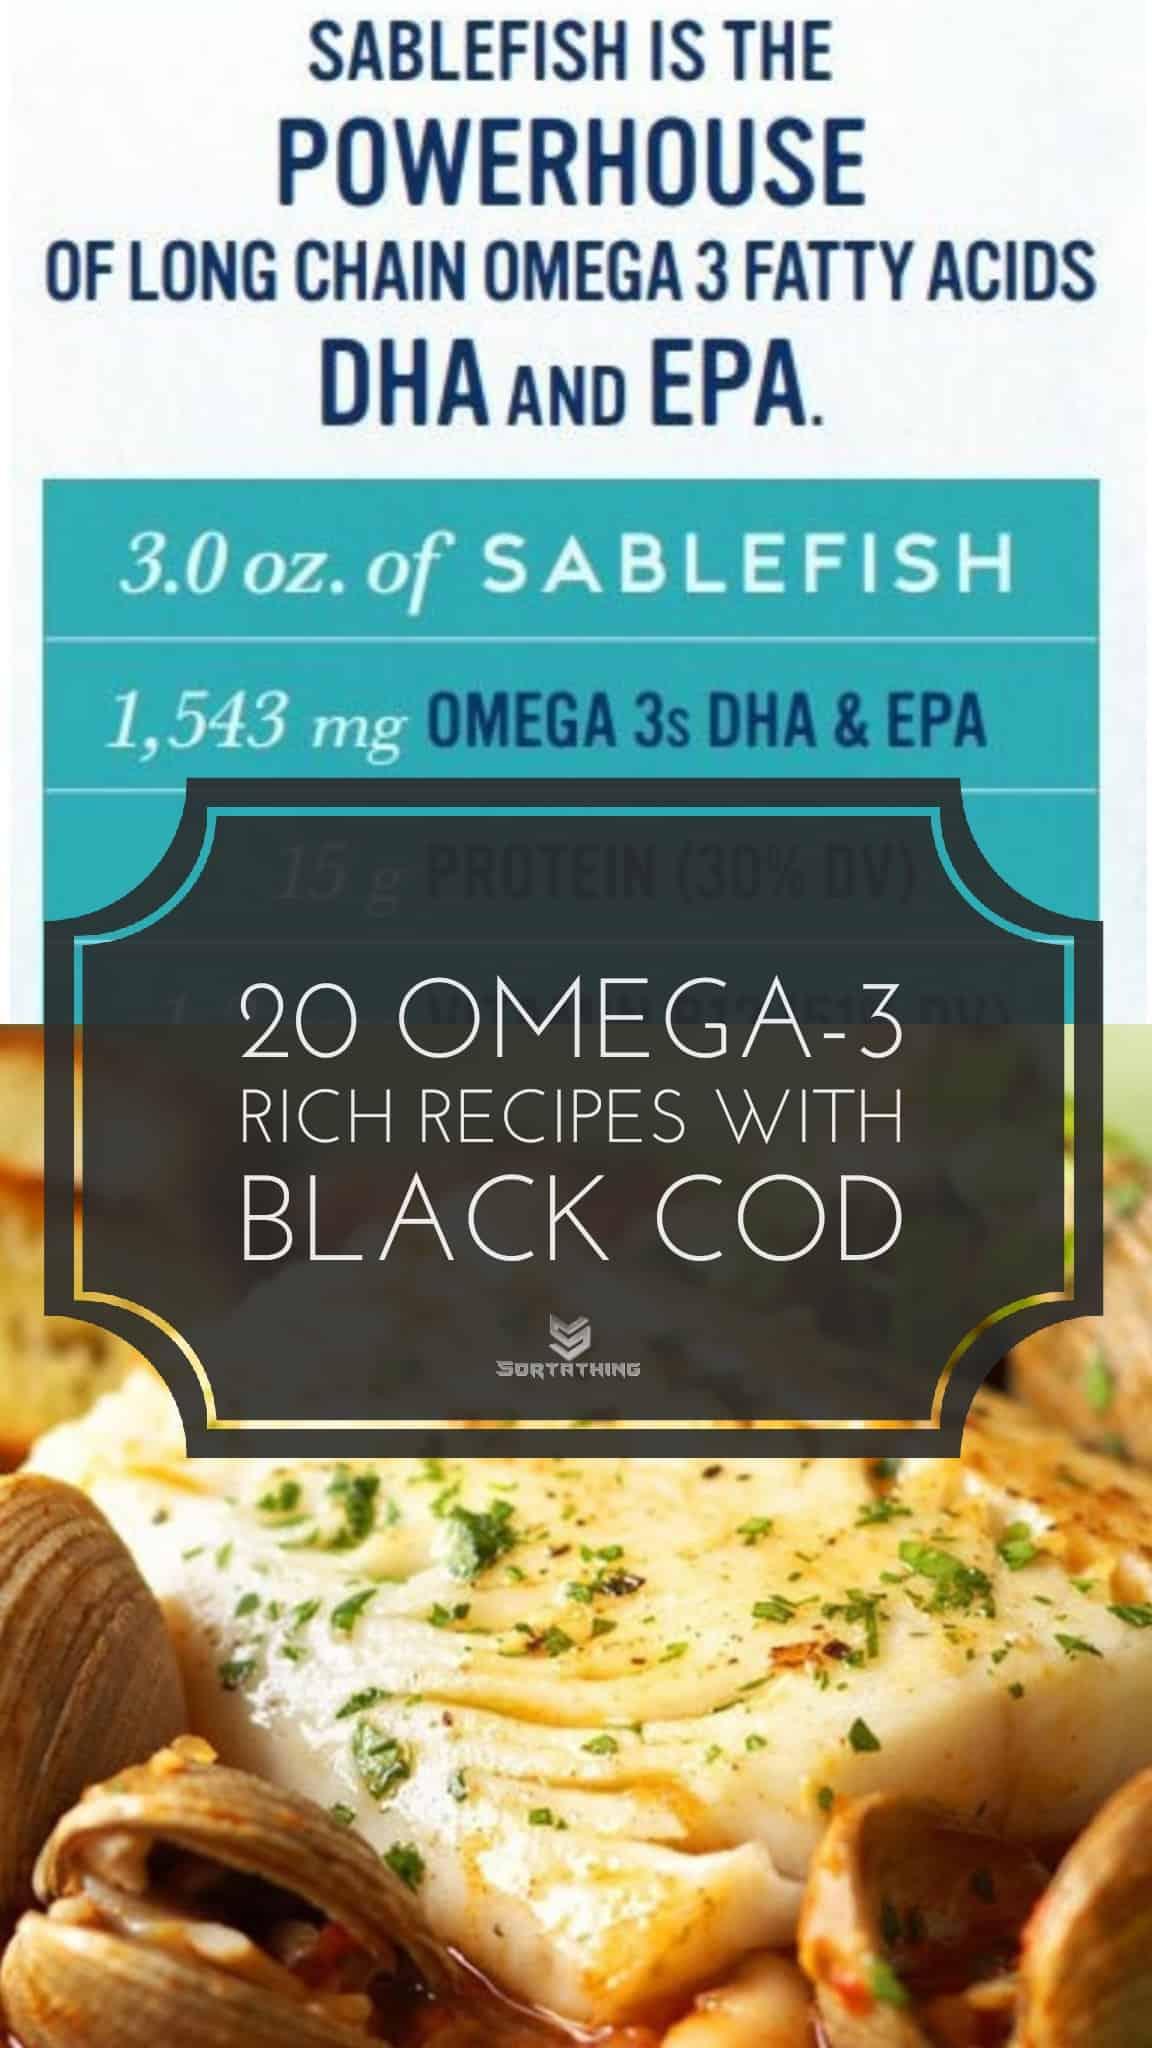 Omega-3 Packed Black Cod Recipes